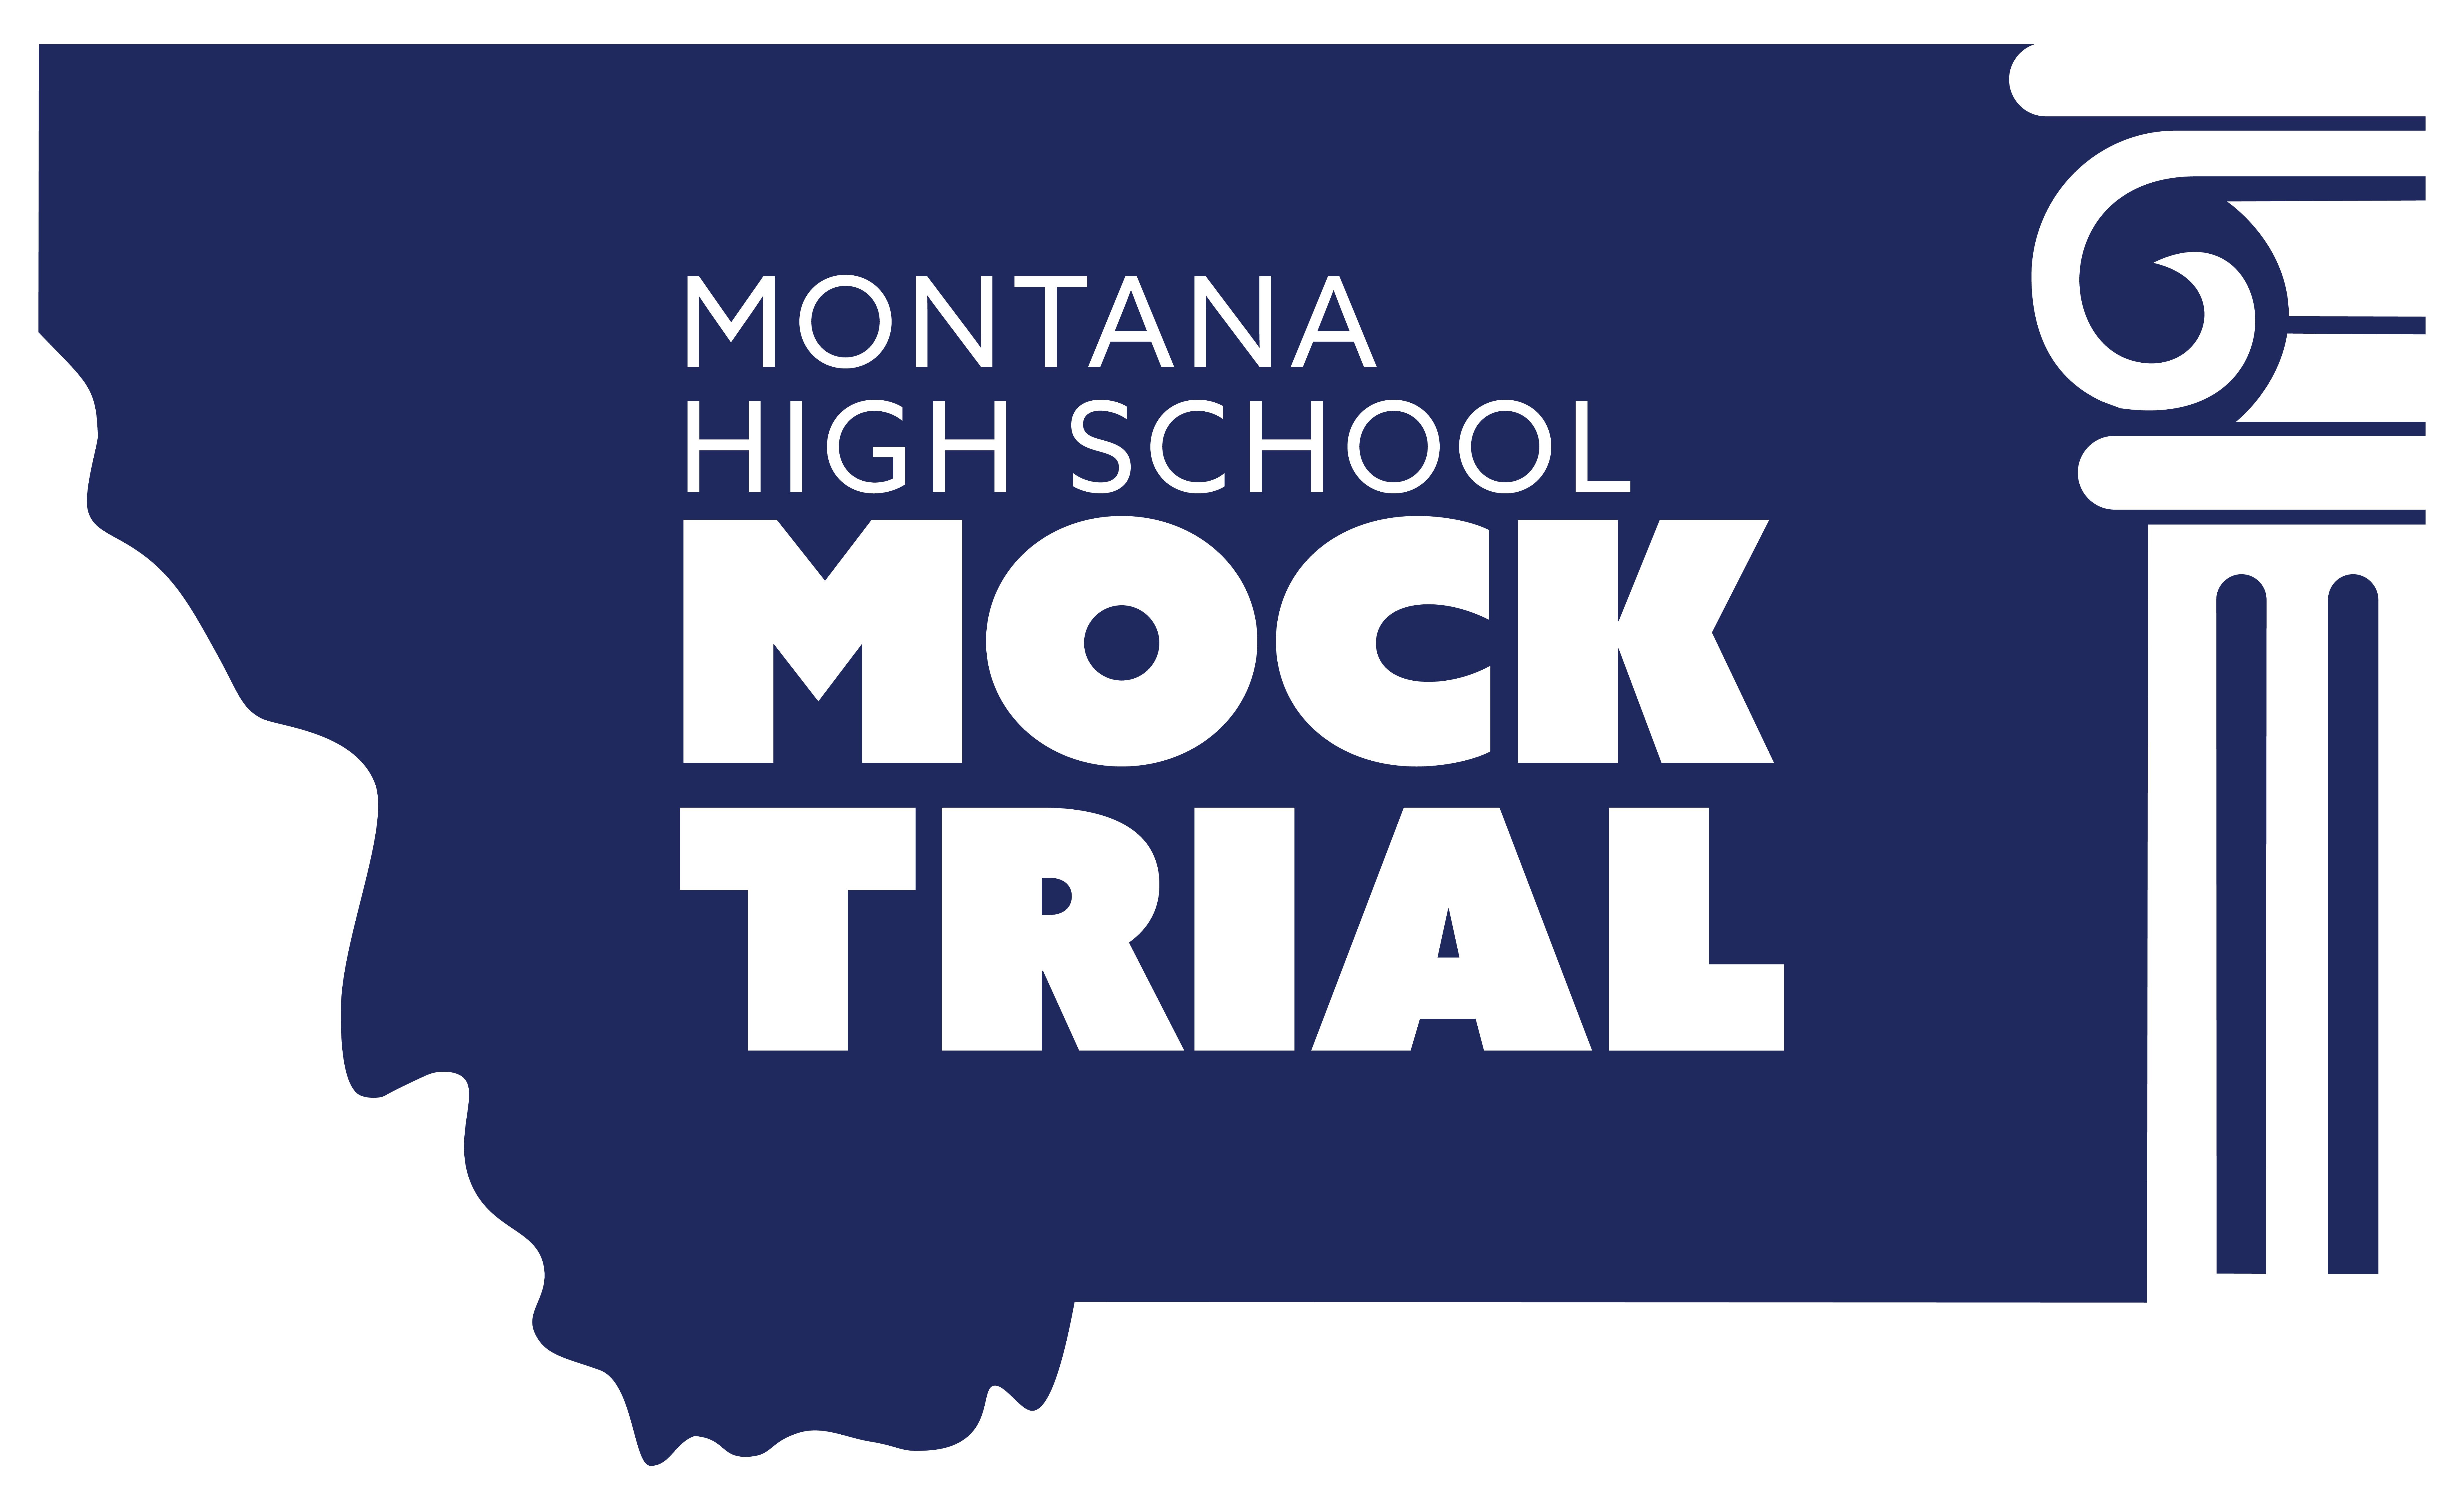 Montana High School Mock Trial